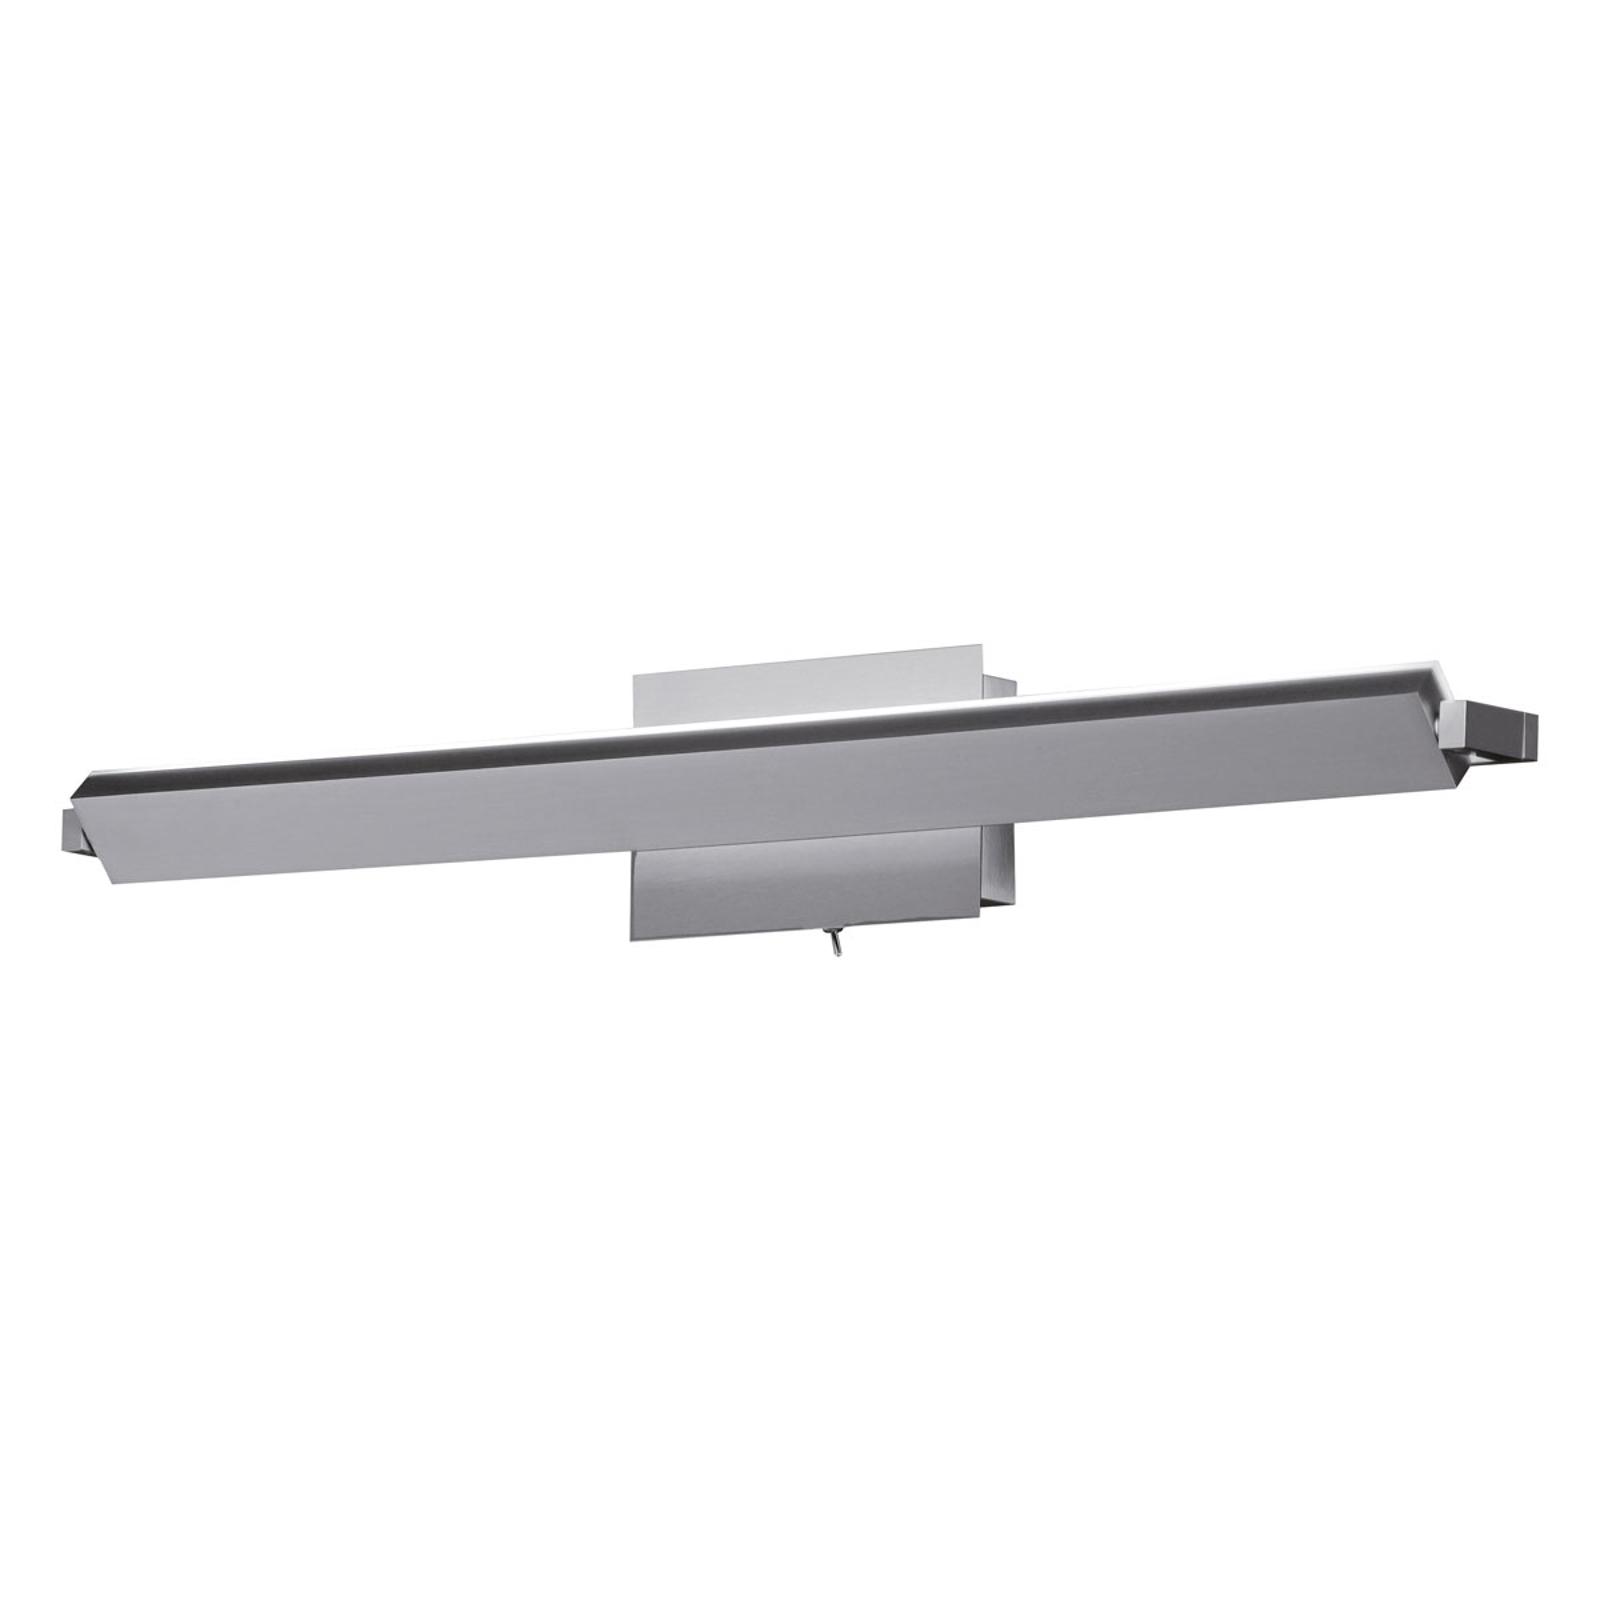 LED wandlamp Pare, draaibaar, m. schakelaar, 58 cm